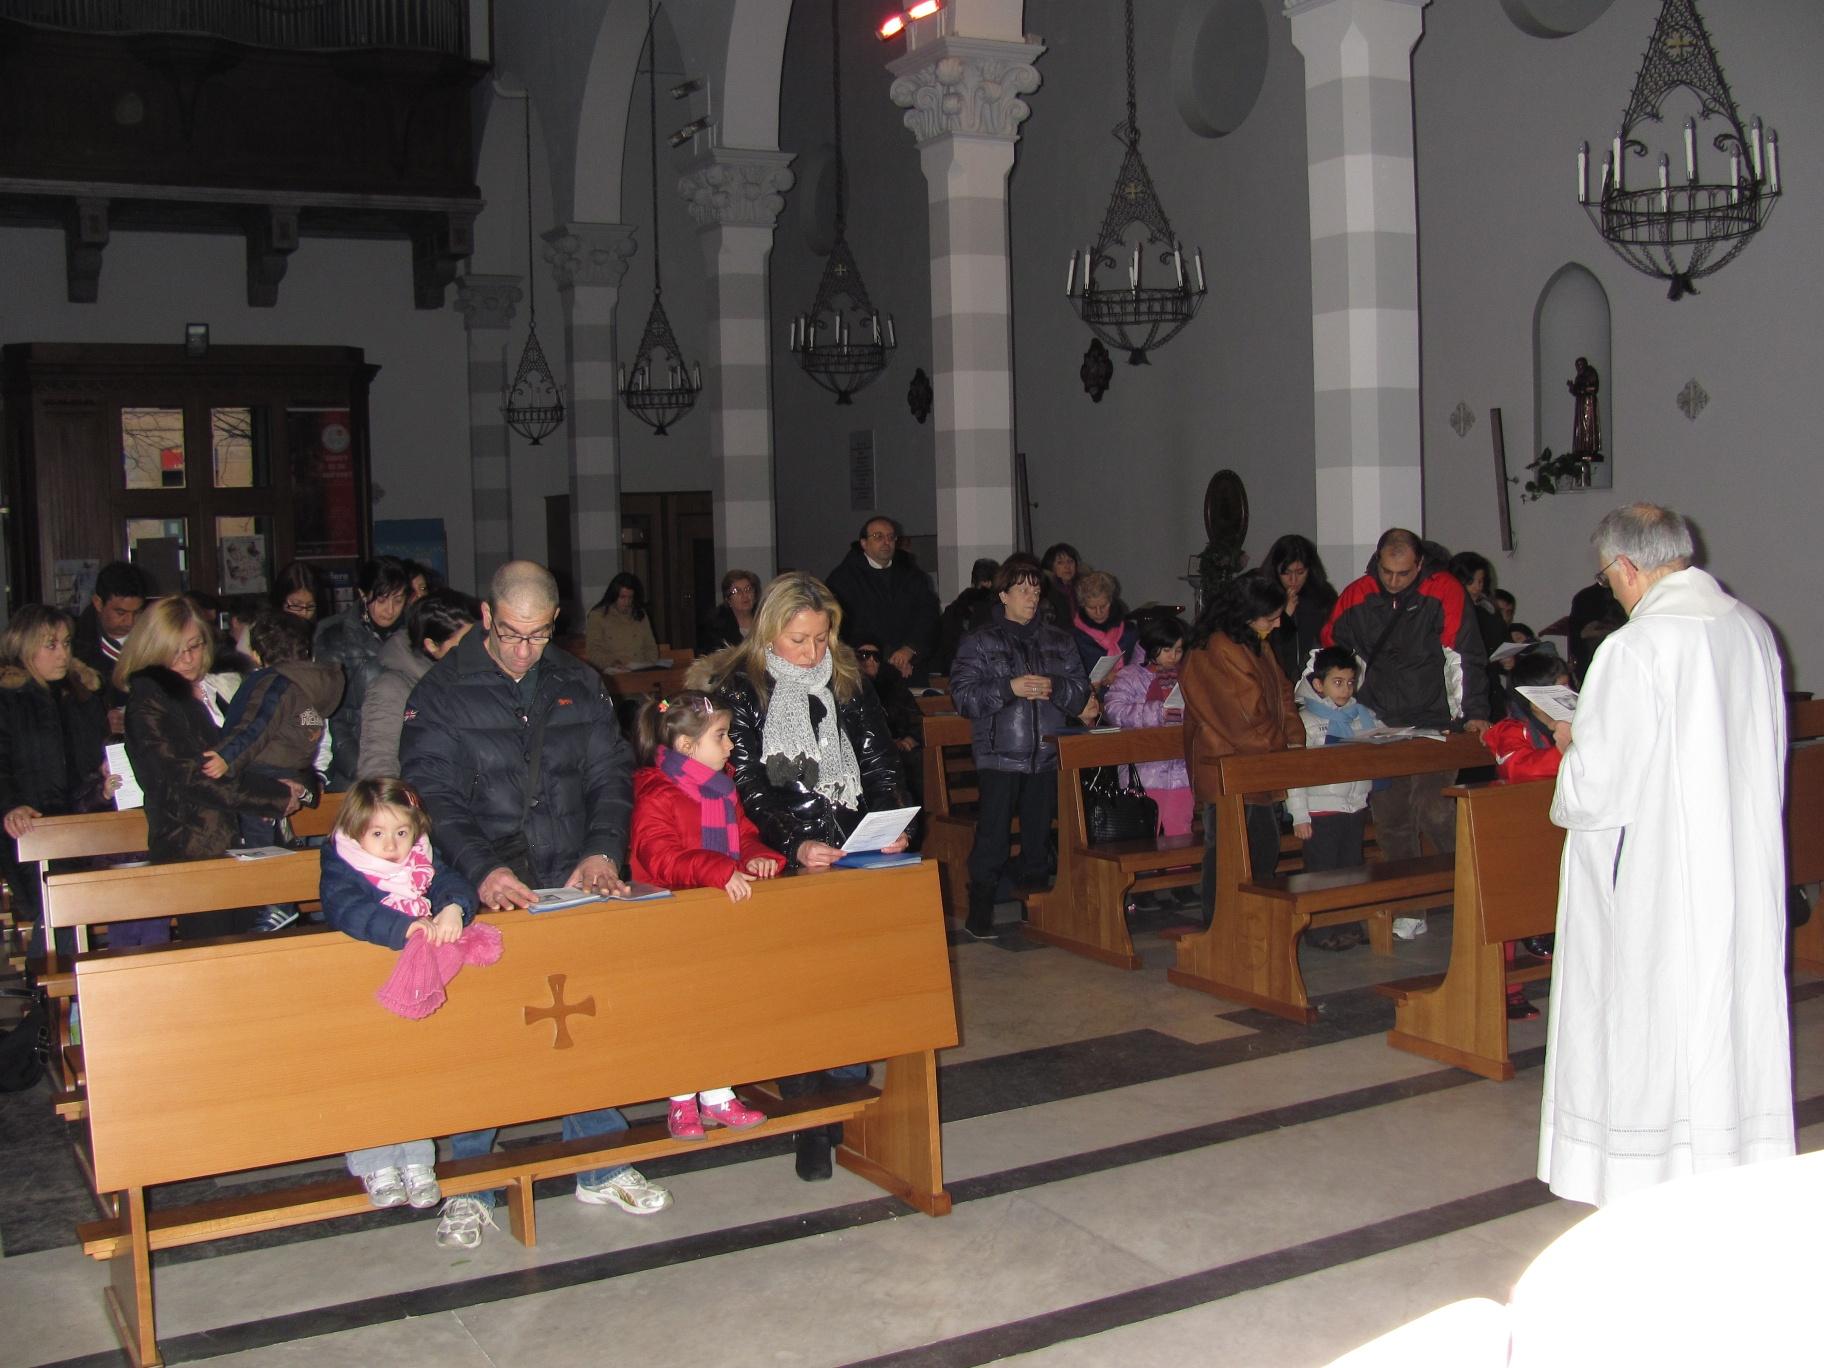 ricordo_battesimo_gesu_2011-01-23-16-22-30